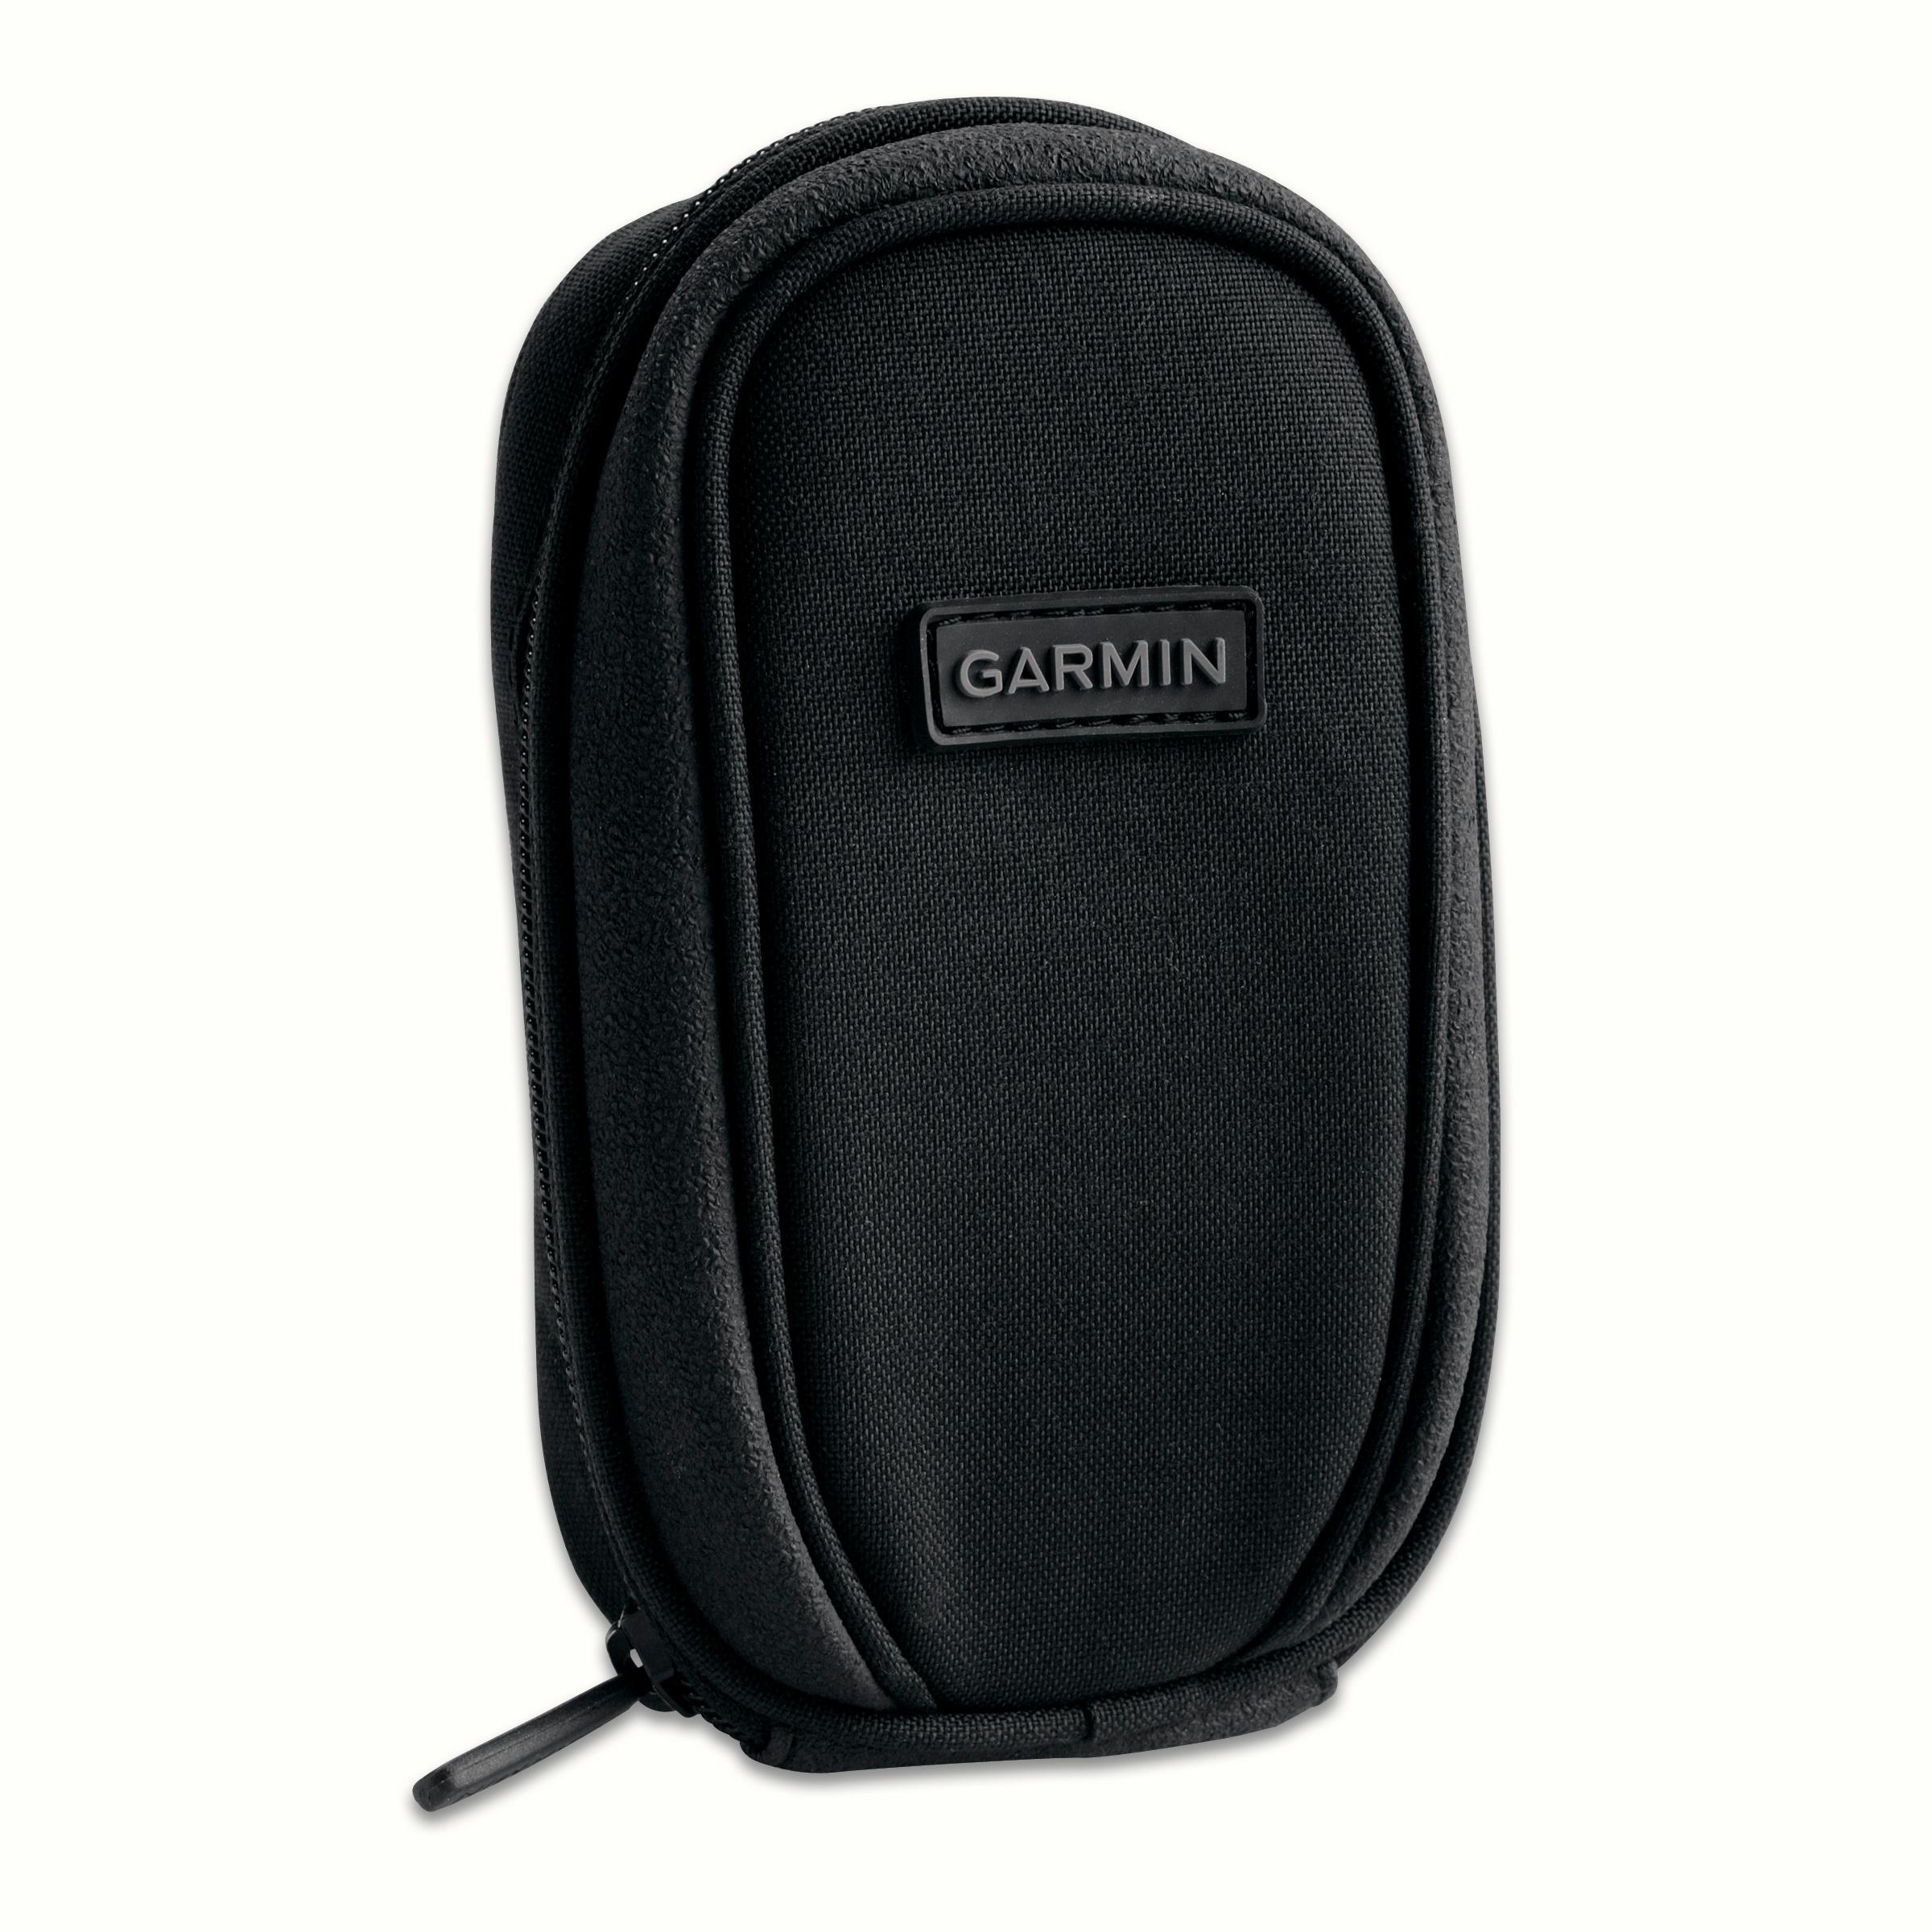 Garmin Oregon Soft Carry Case Black